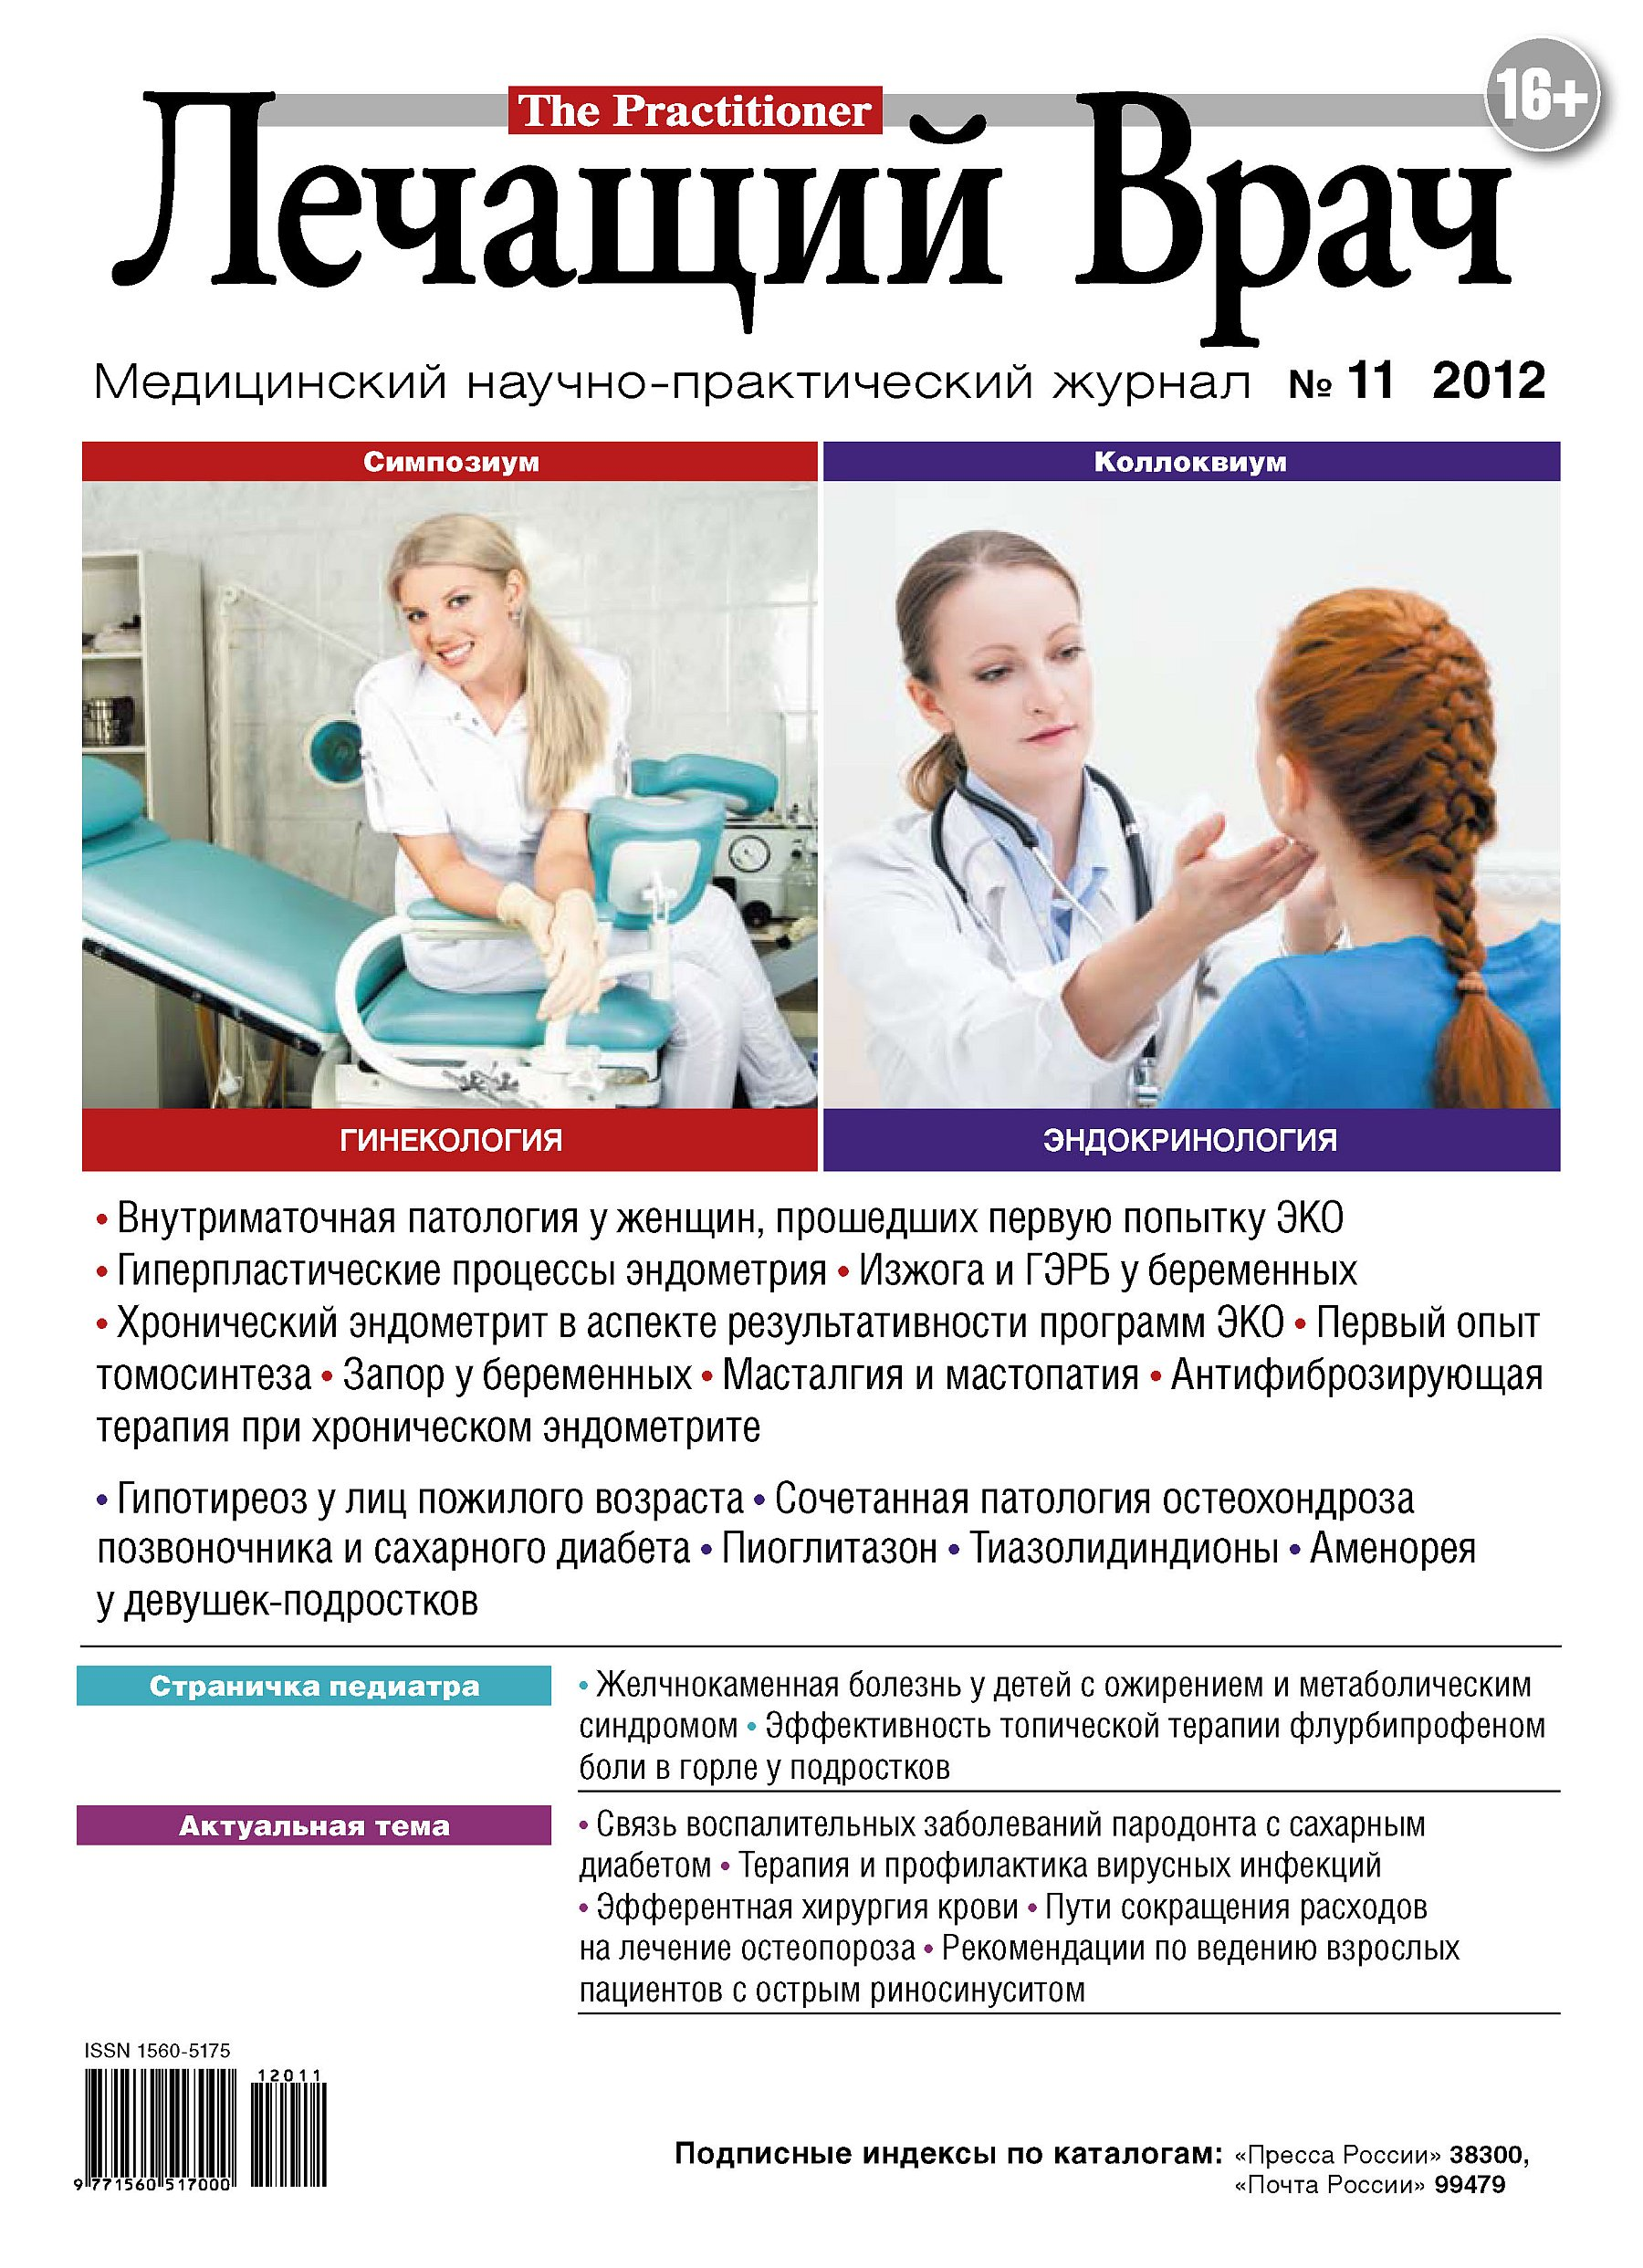 Журнал «Лечащий Врач» №11/2012